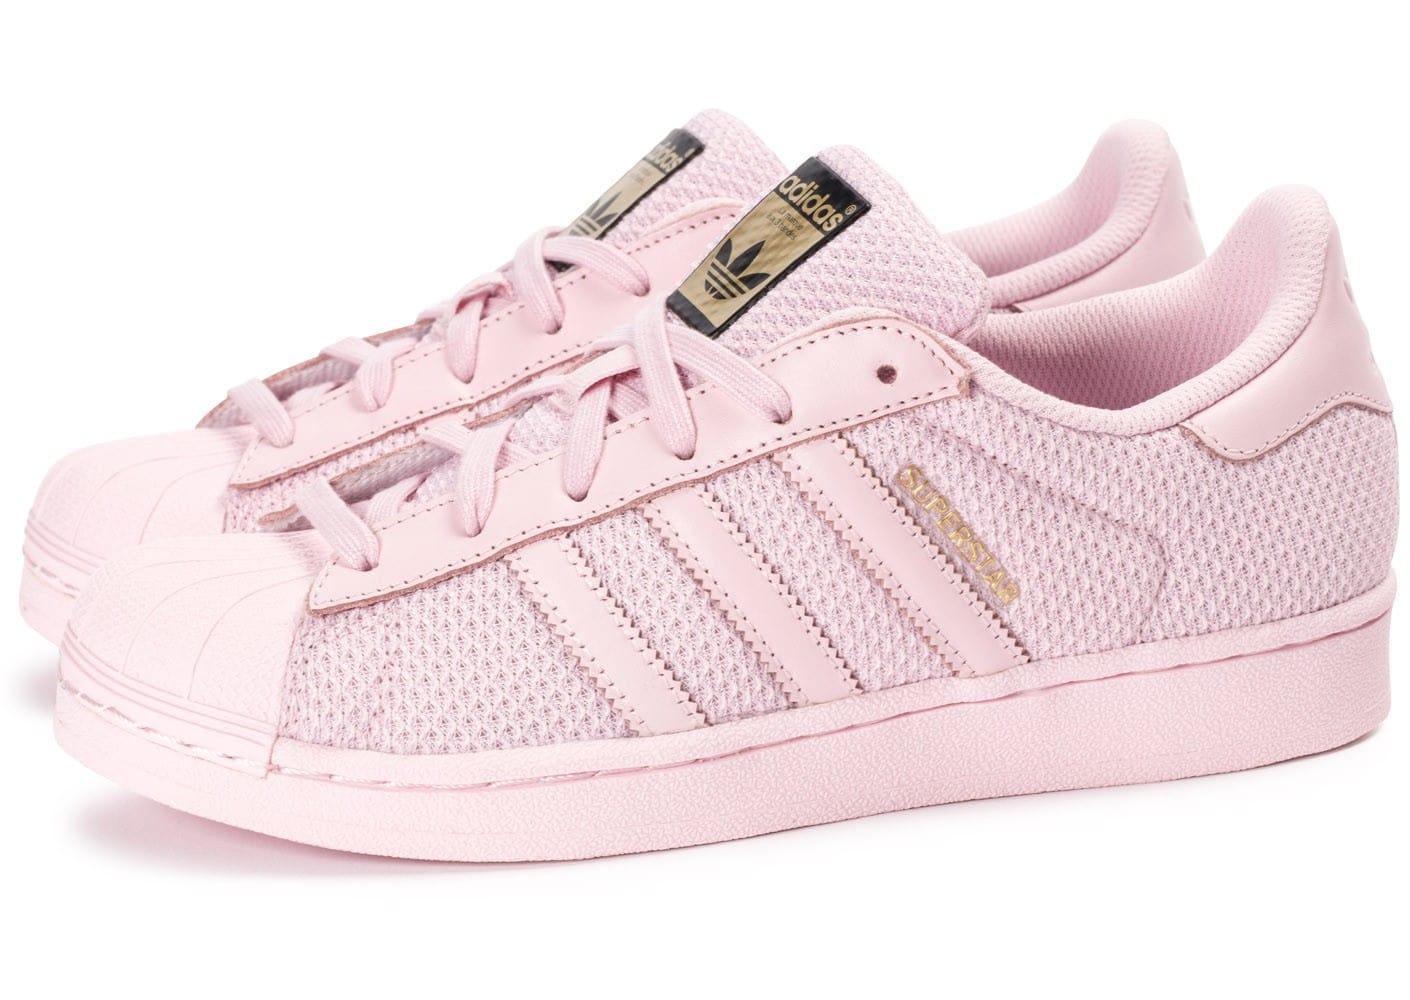 check out 4d1a9 4a2f2 adidas superstar junior rose